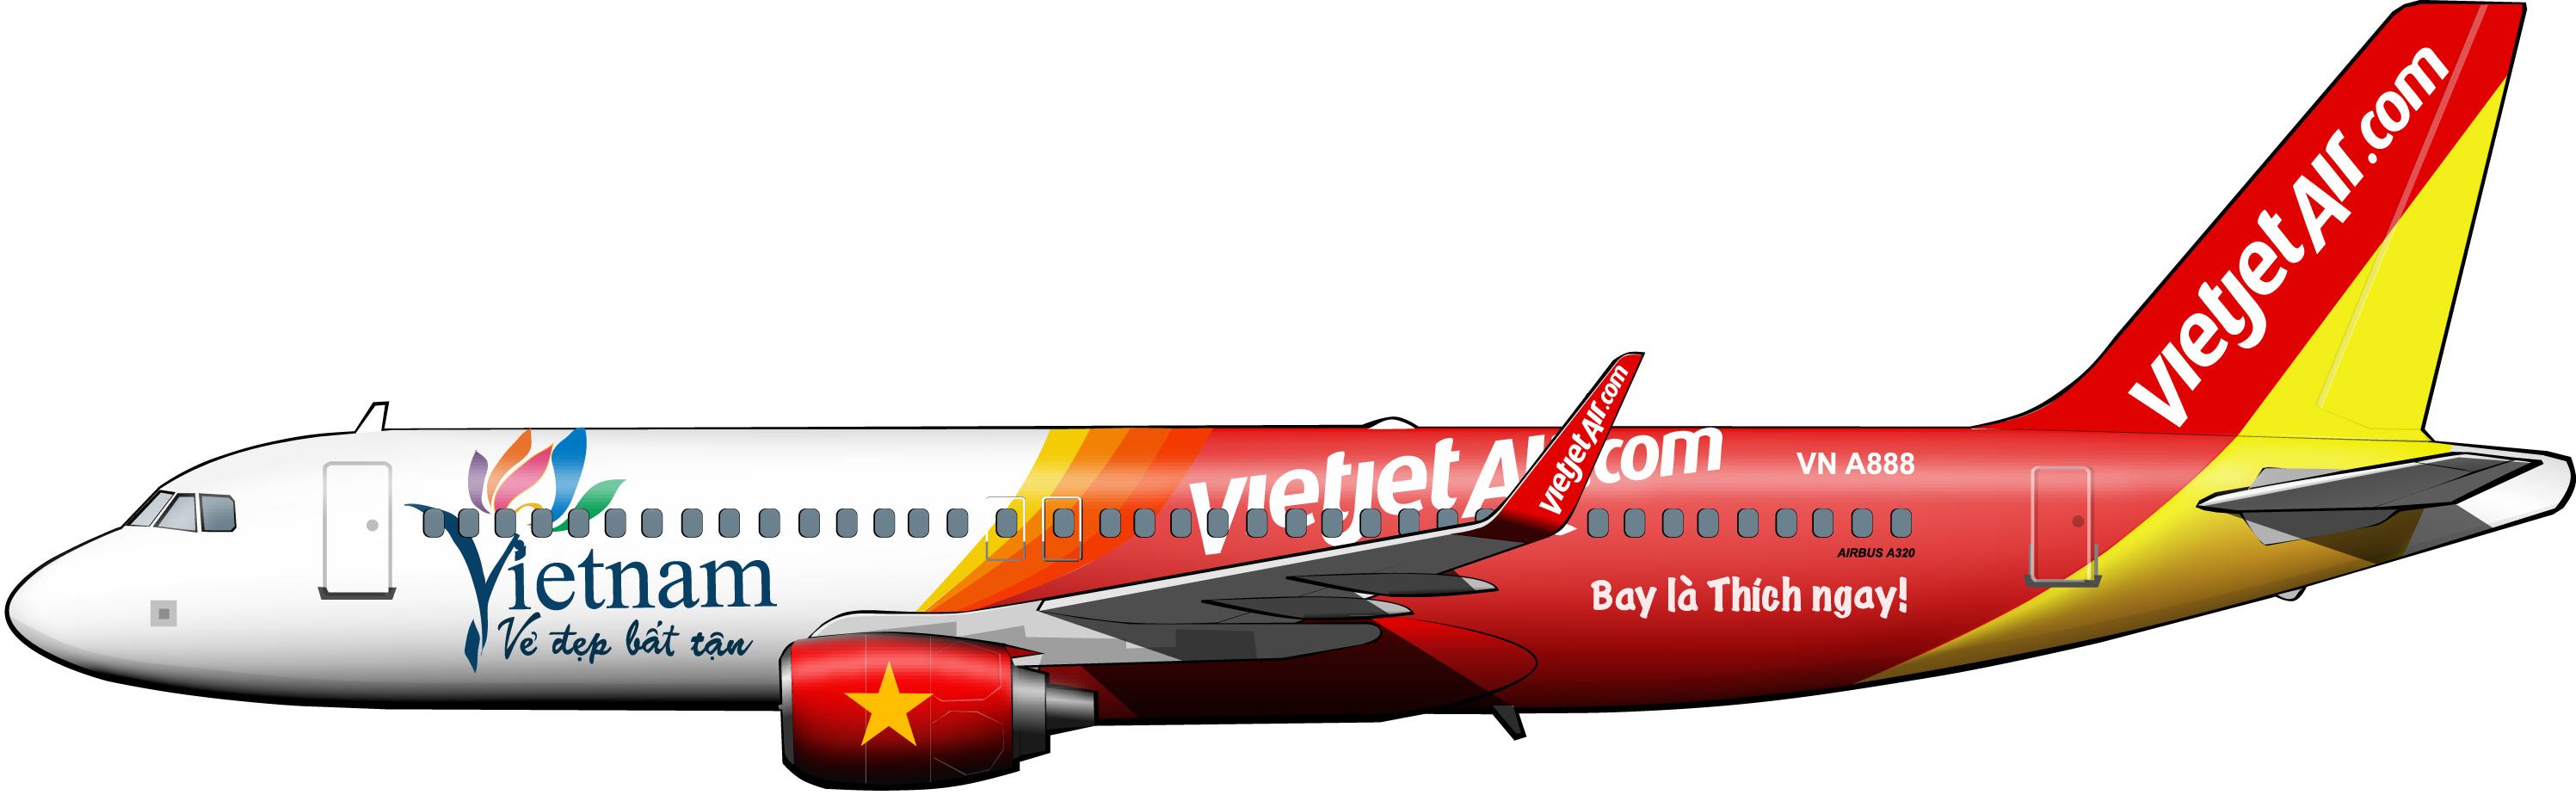 airbus320vietjetair2015